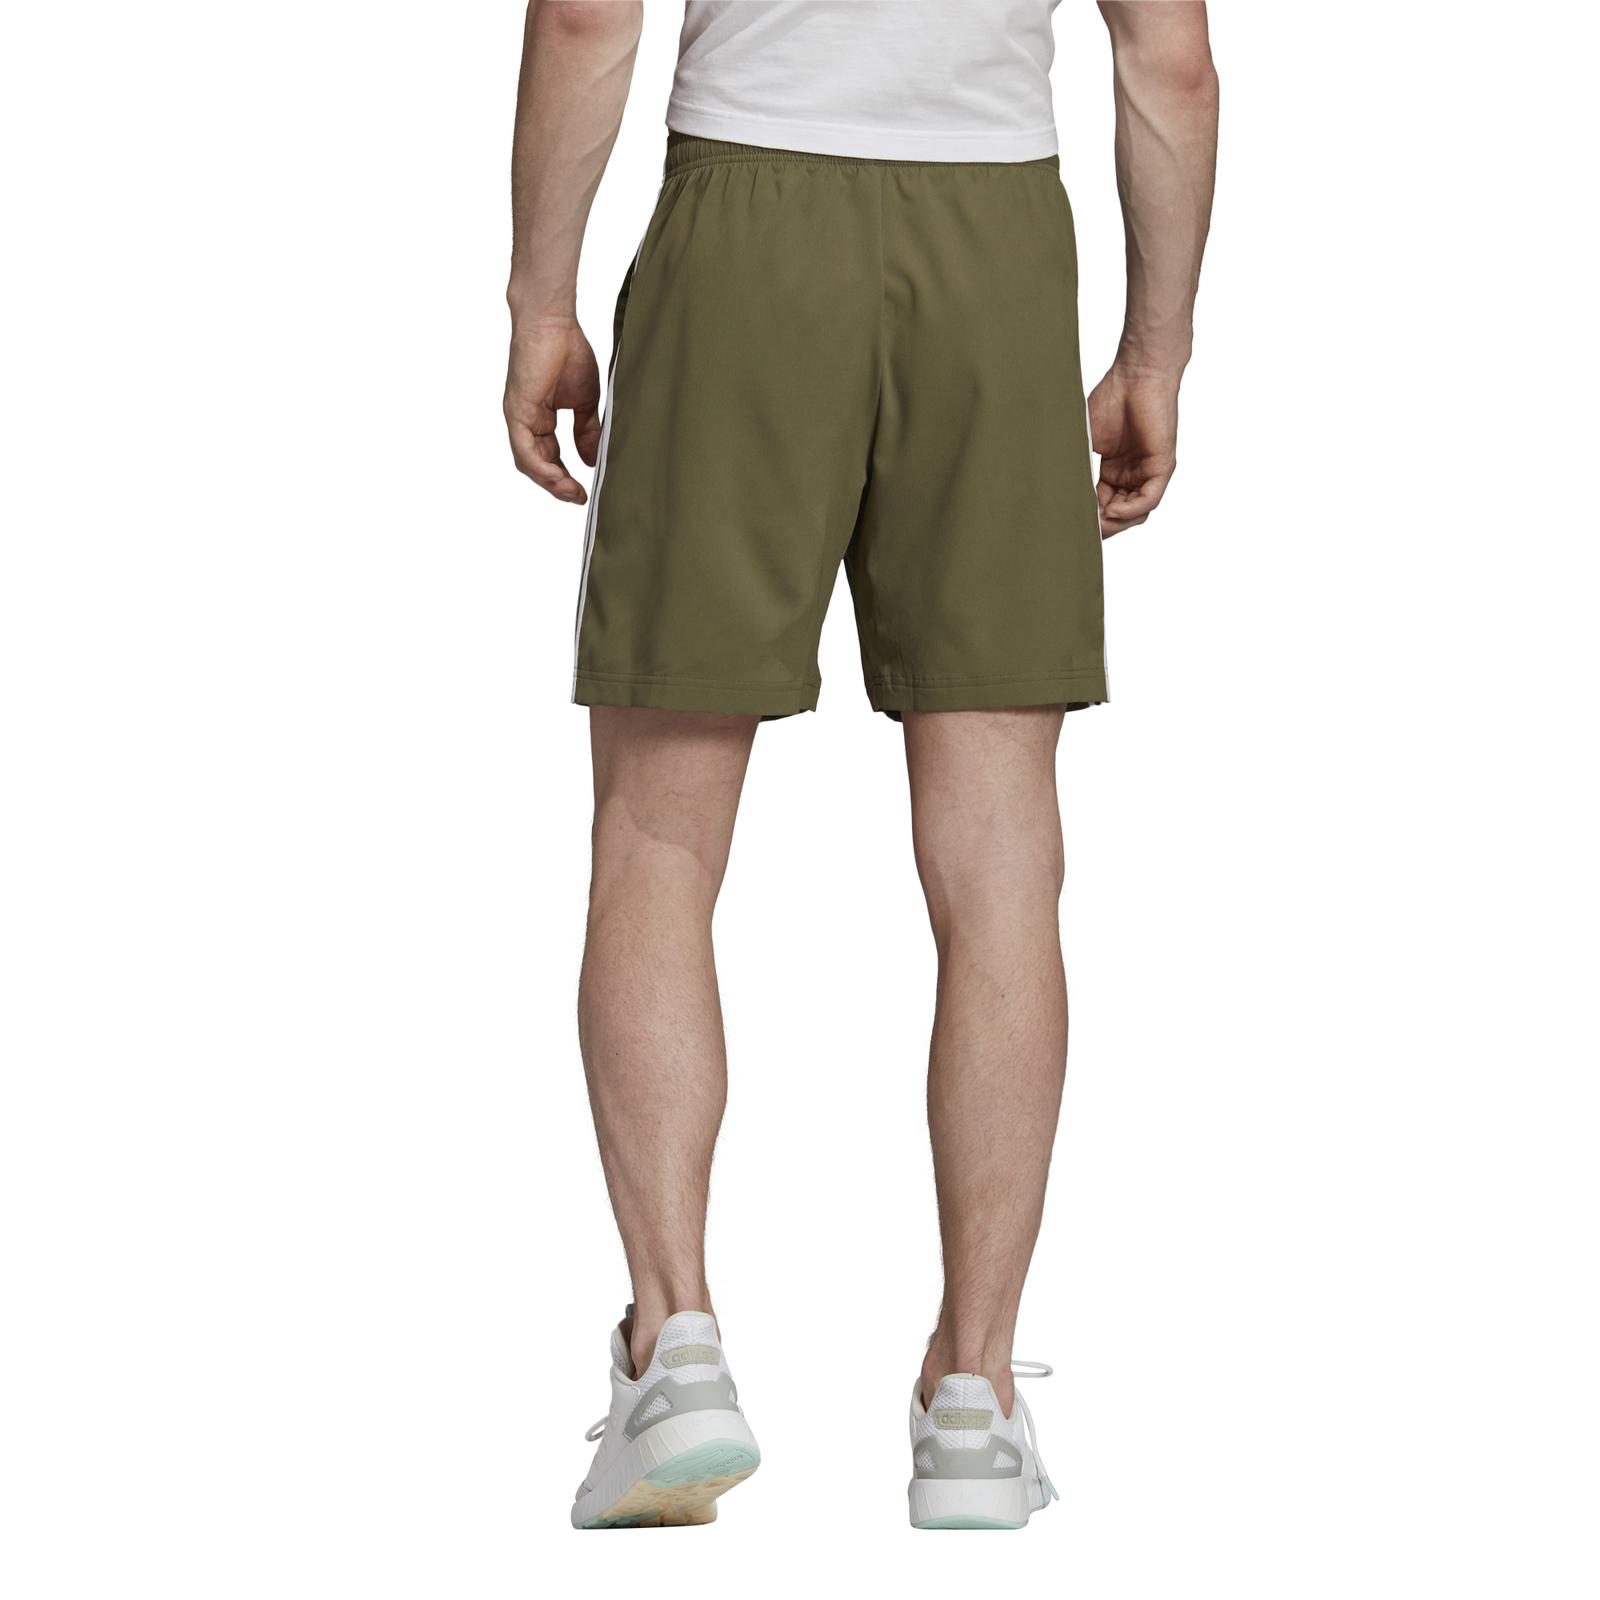 Adidas Performance Mens Sport Short Essentials 3 Stripes 7in Chelsea Green | eBay